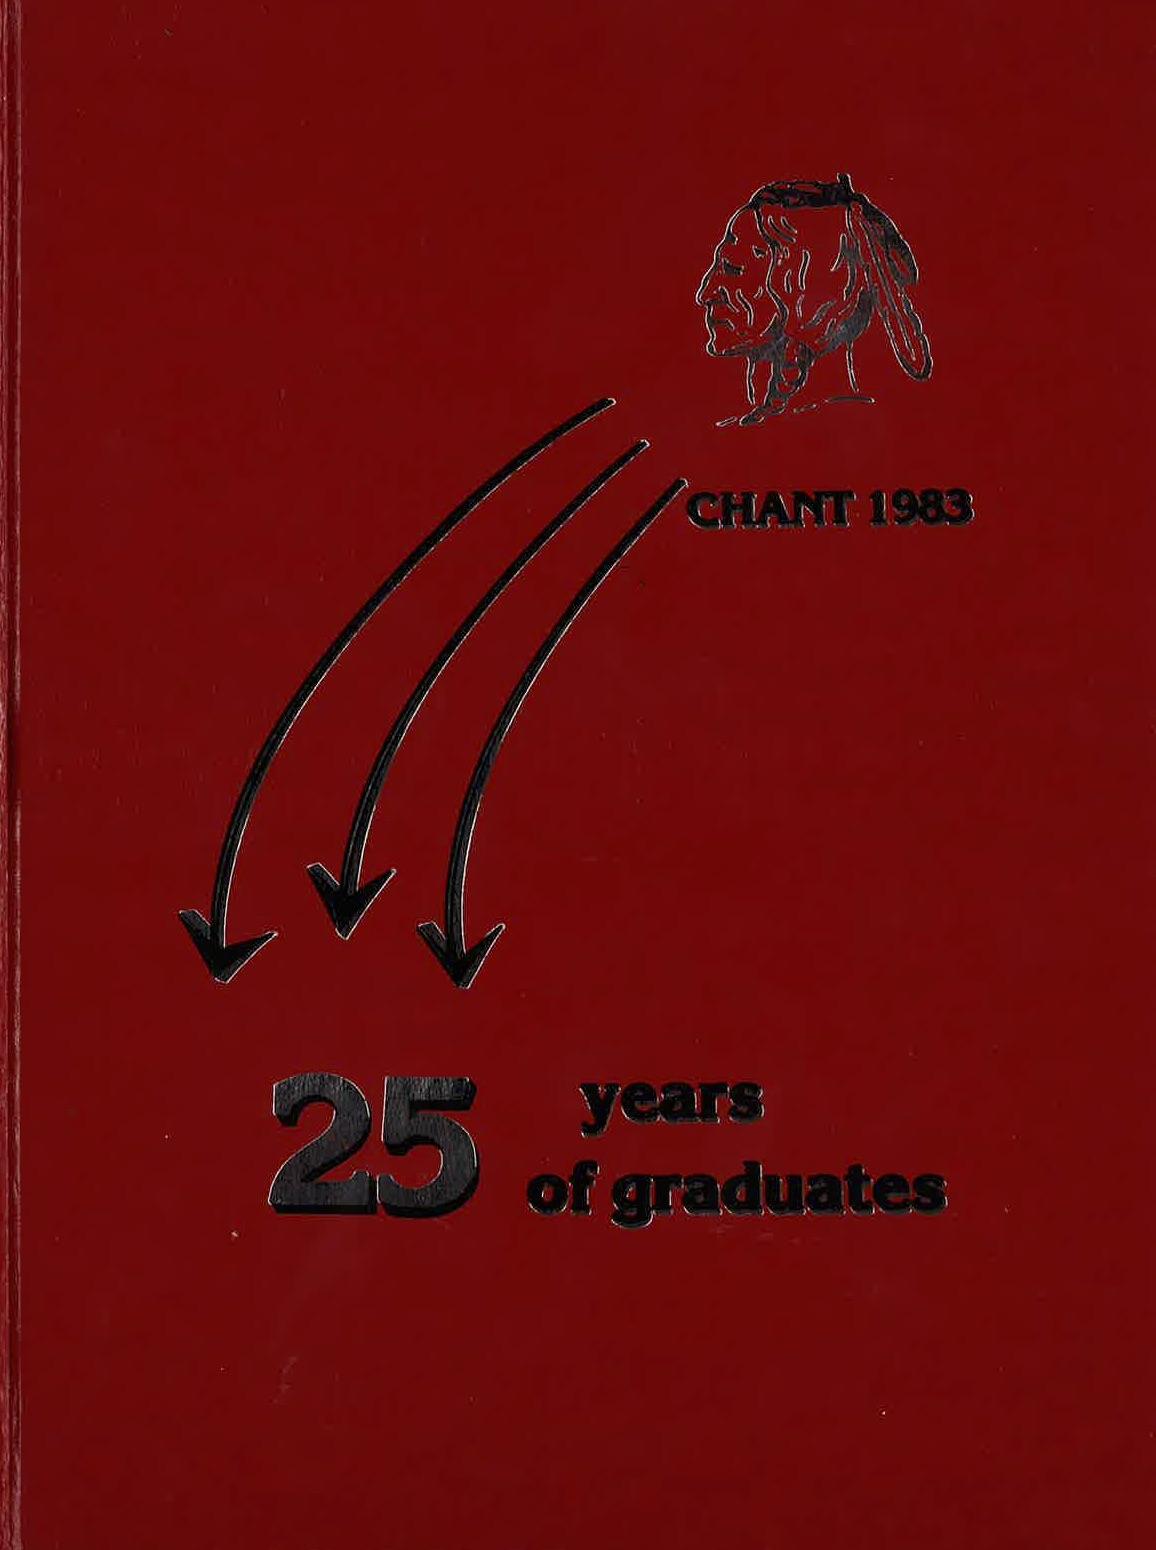 1983_Yearbook_Cover.jpg